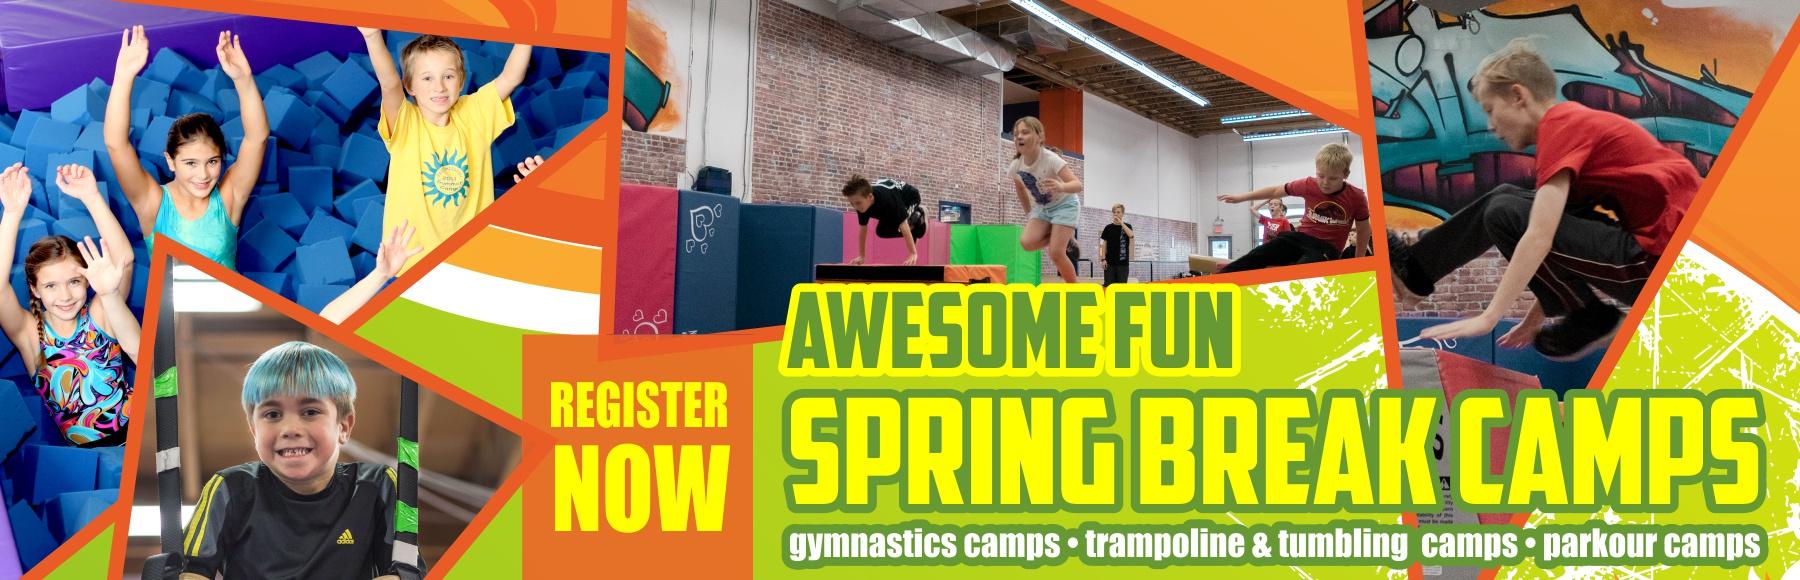 Kelowna gymnastics spring break camps